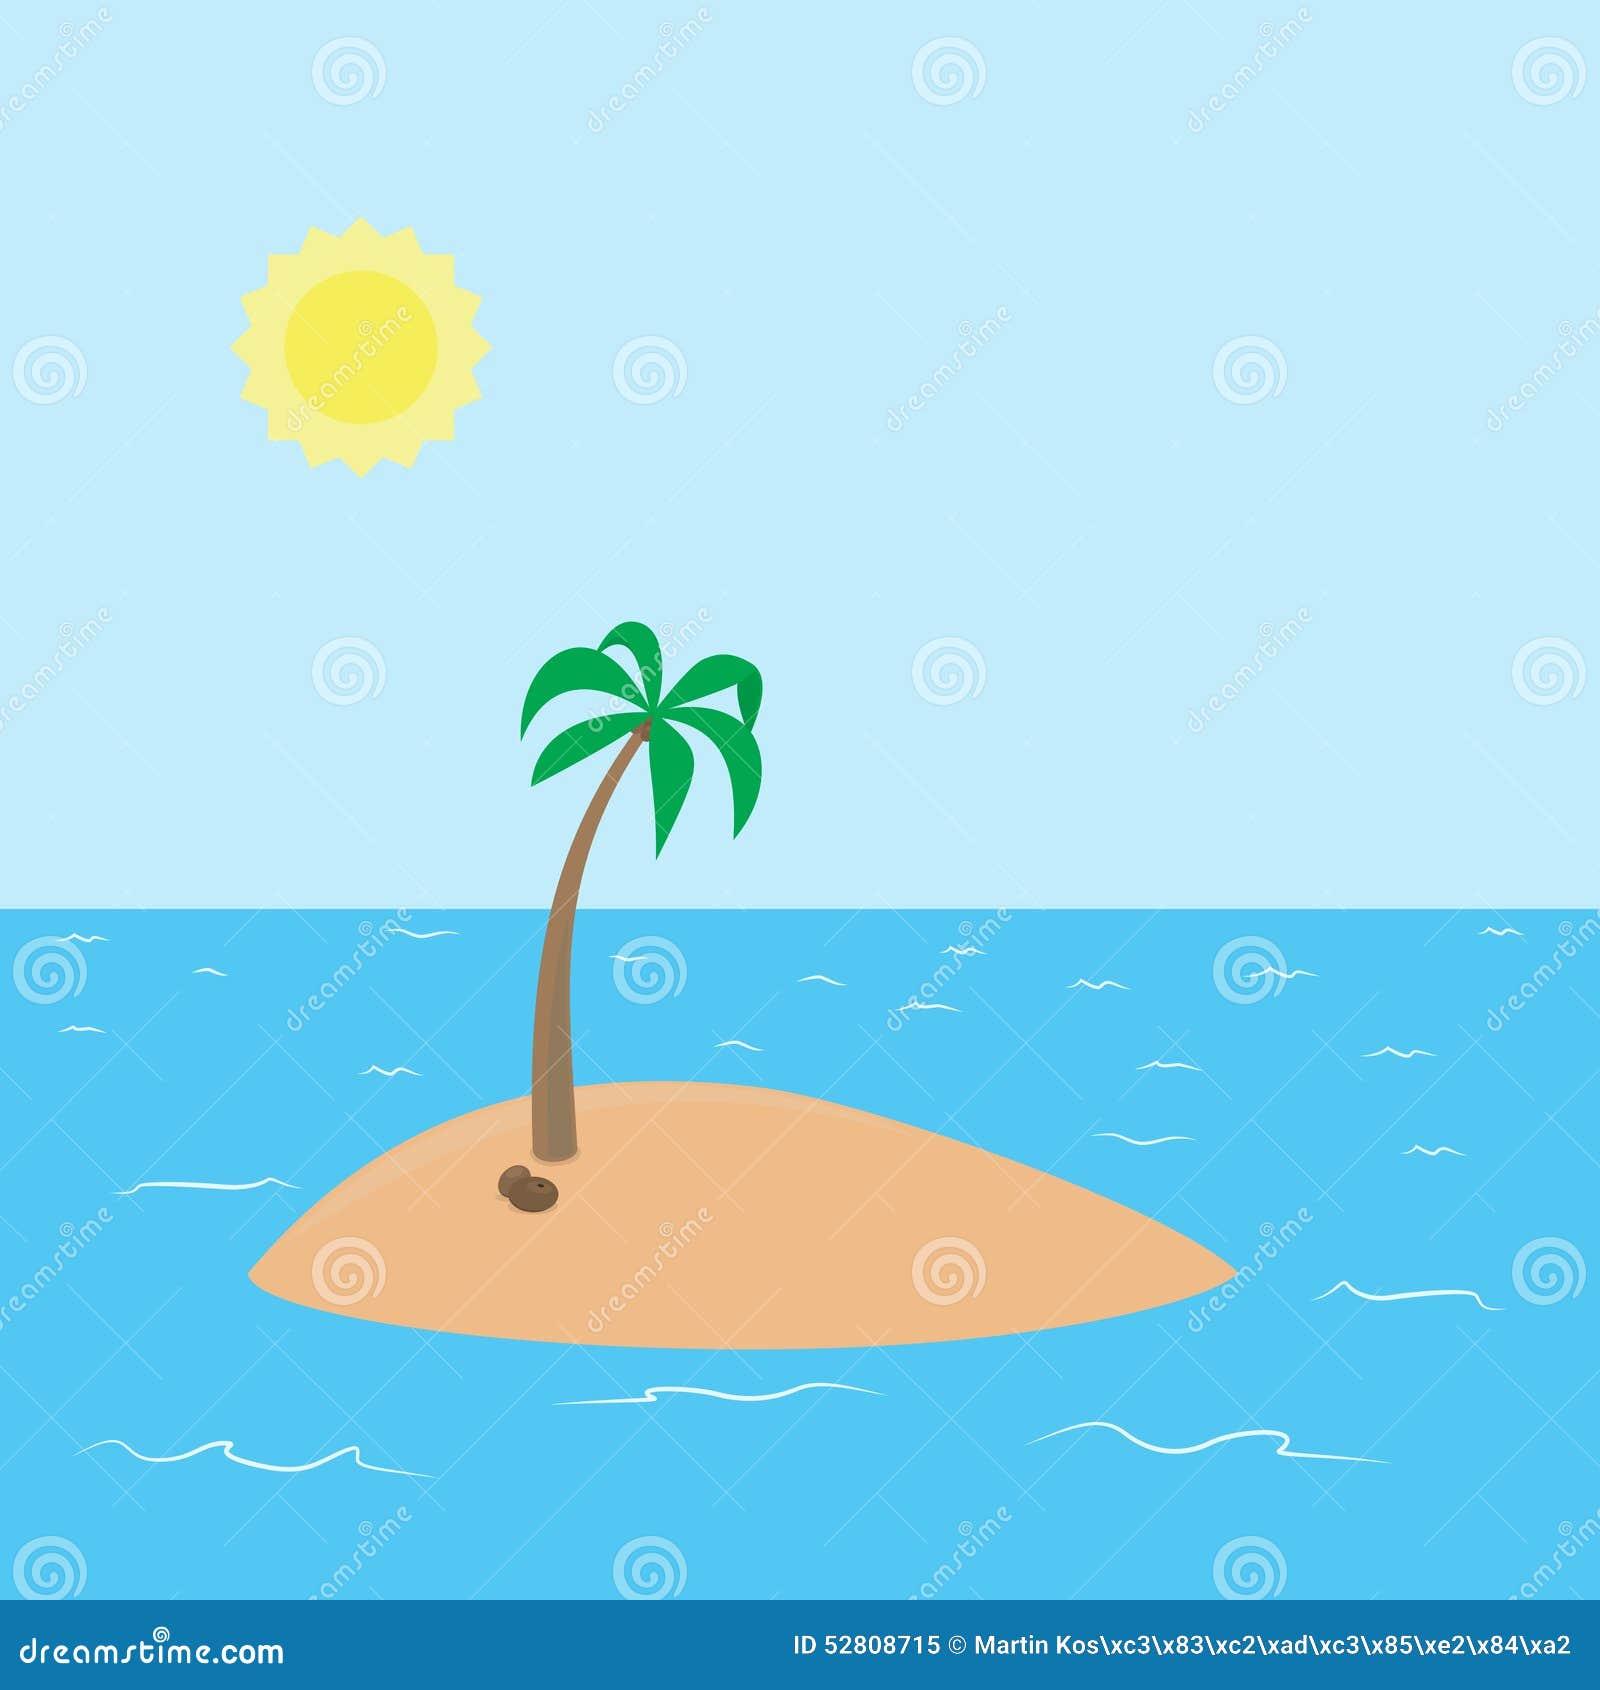 Deserted Island Beach: Deserted Tropical Island With Beach And Coconut Stock